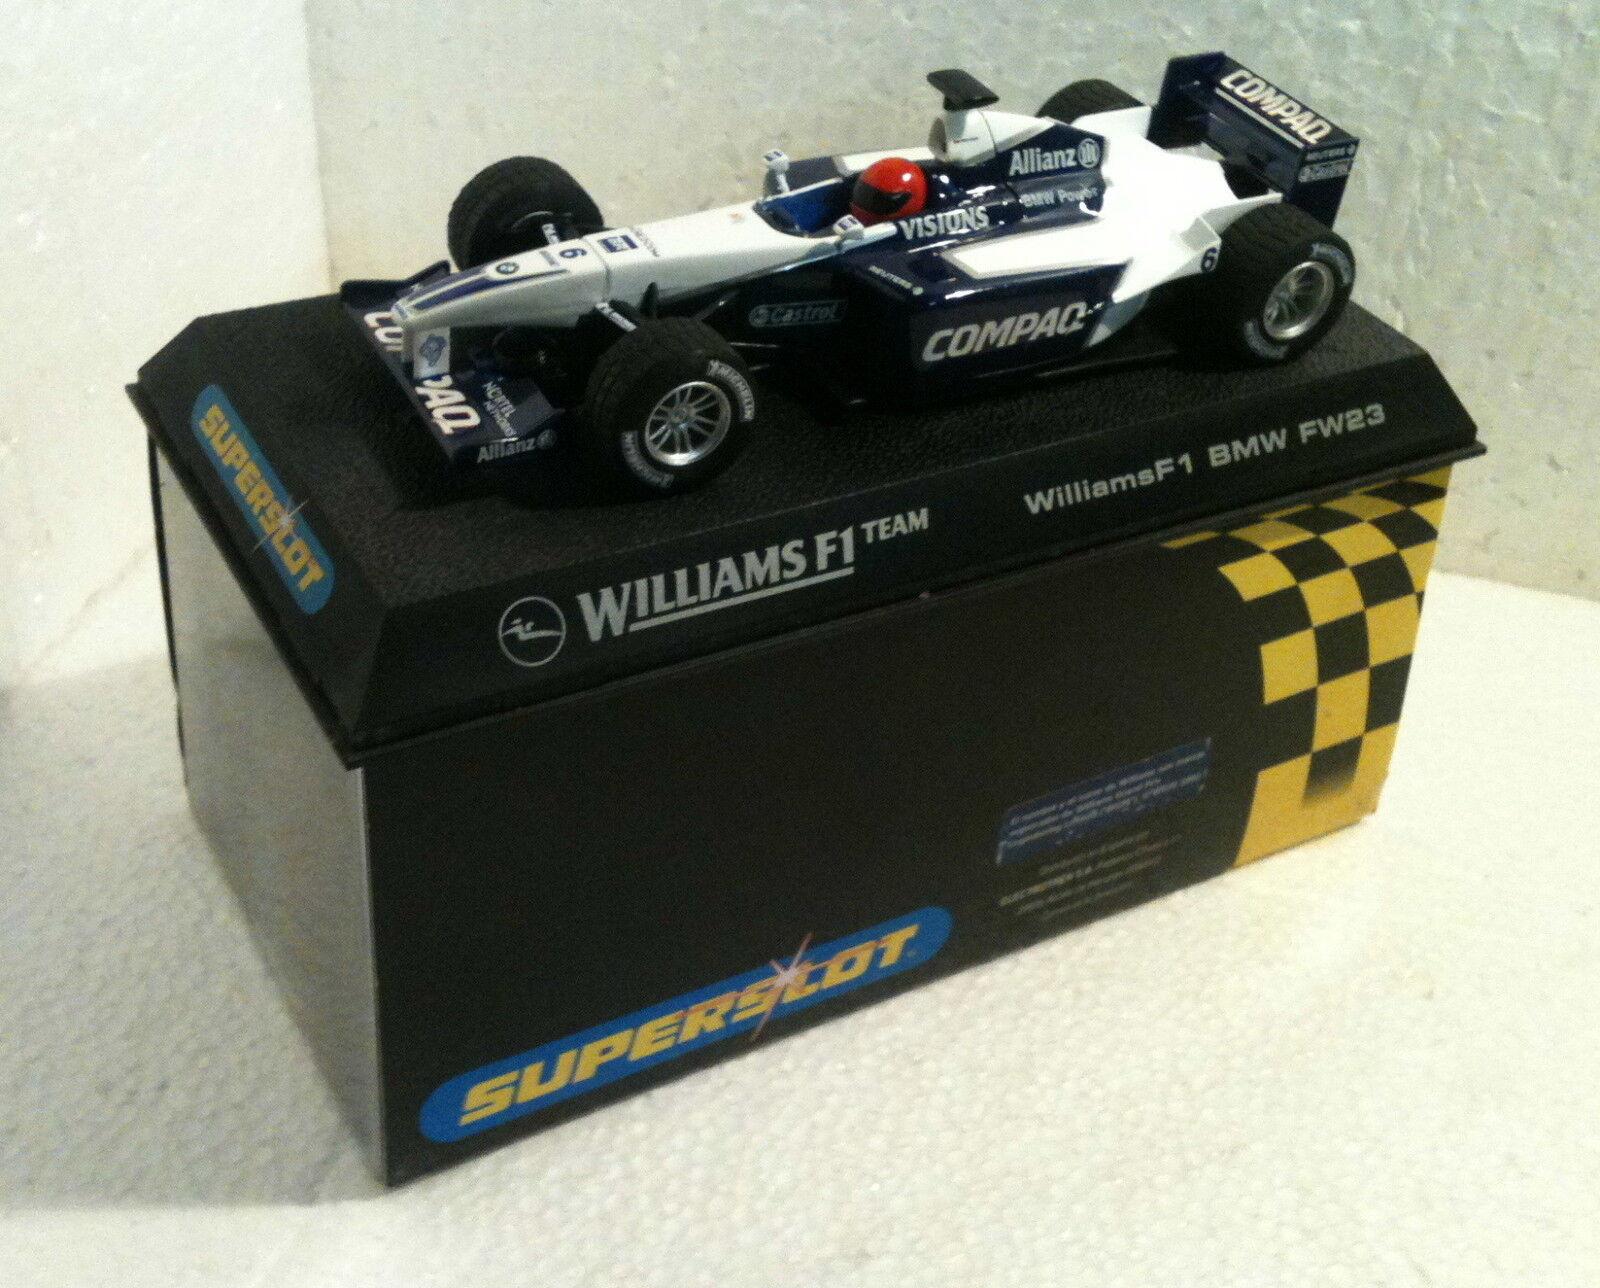 Qq H 2335 SUPERSLOT BMW WILLIAMS F1 FW23 MONTOYA - Scalextric UK